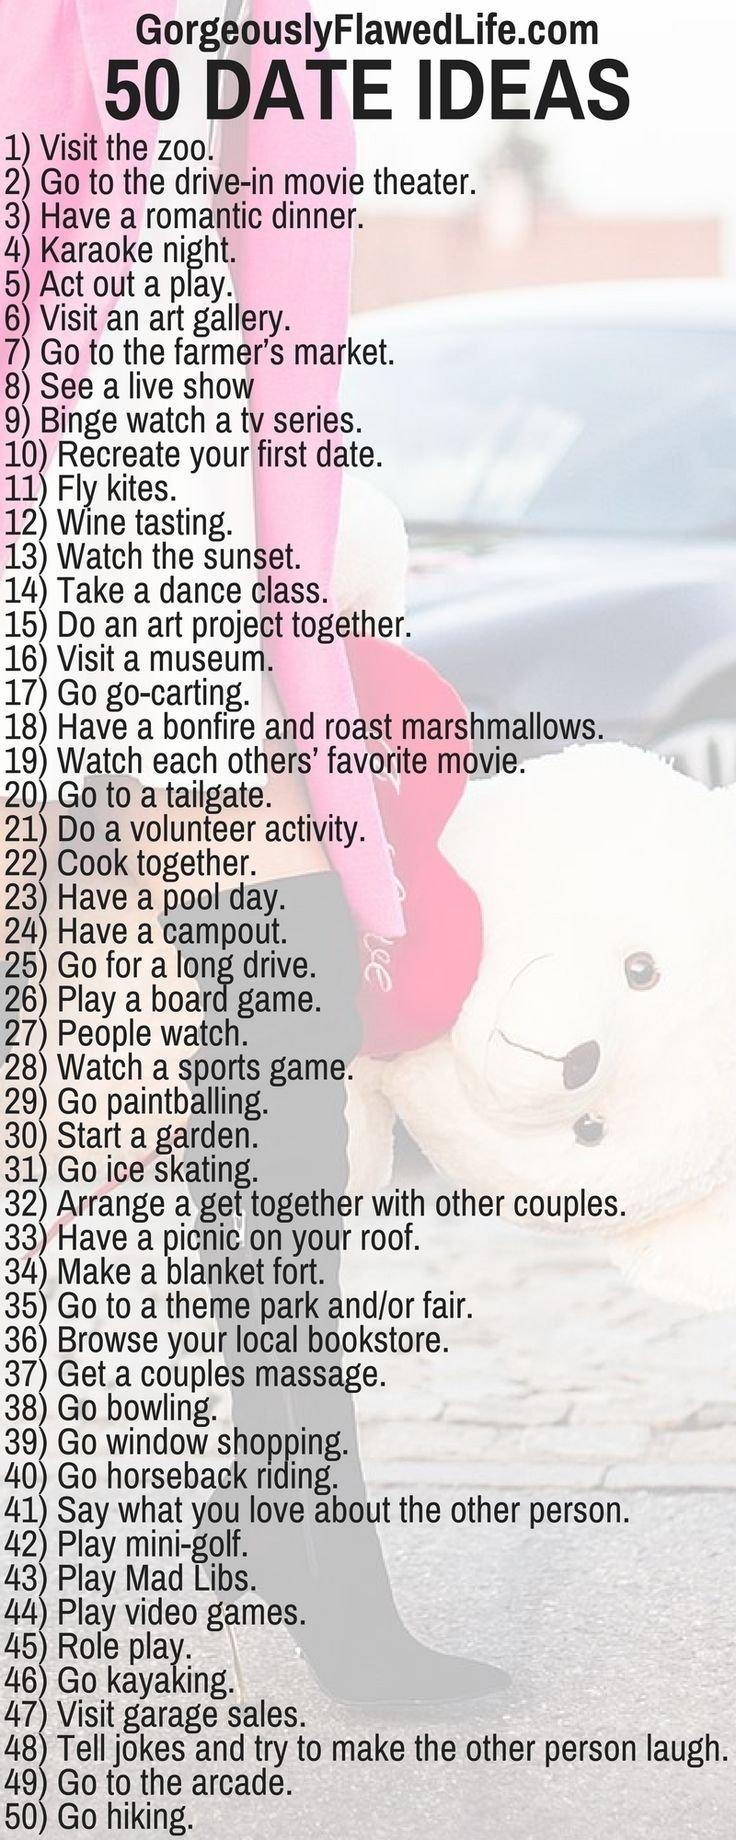 10 Stylish Cute Date Ideas For Your Boyfriend 935 best boyfriend gift ideas images on pinterest boyfriend gift 7 2020